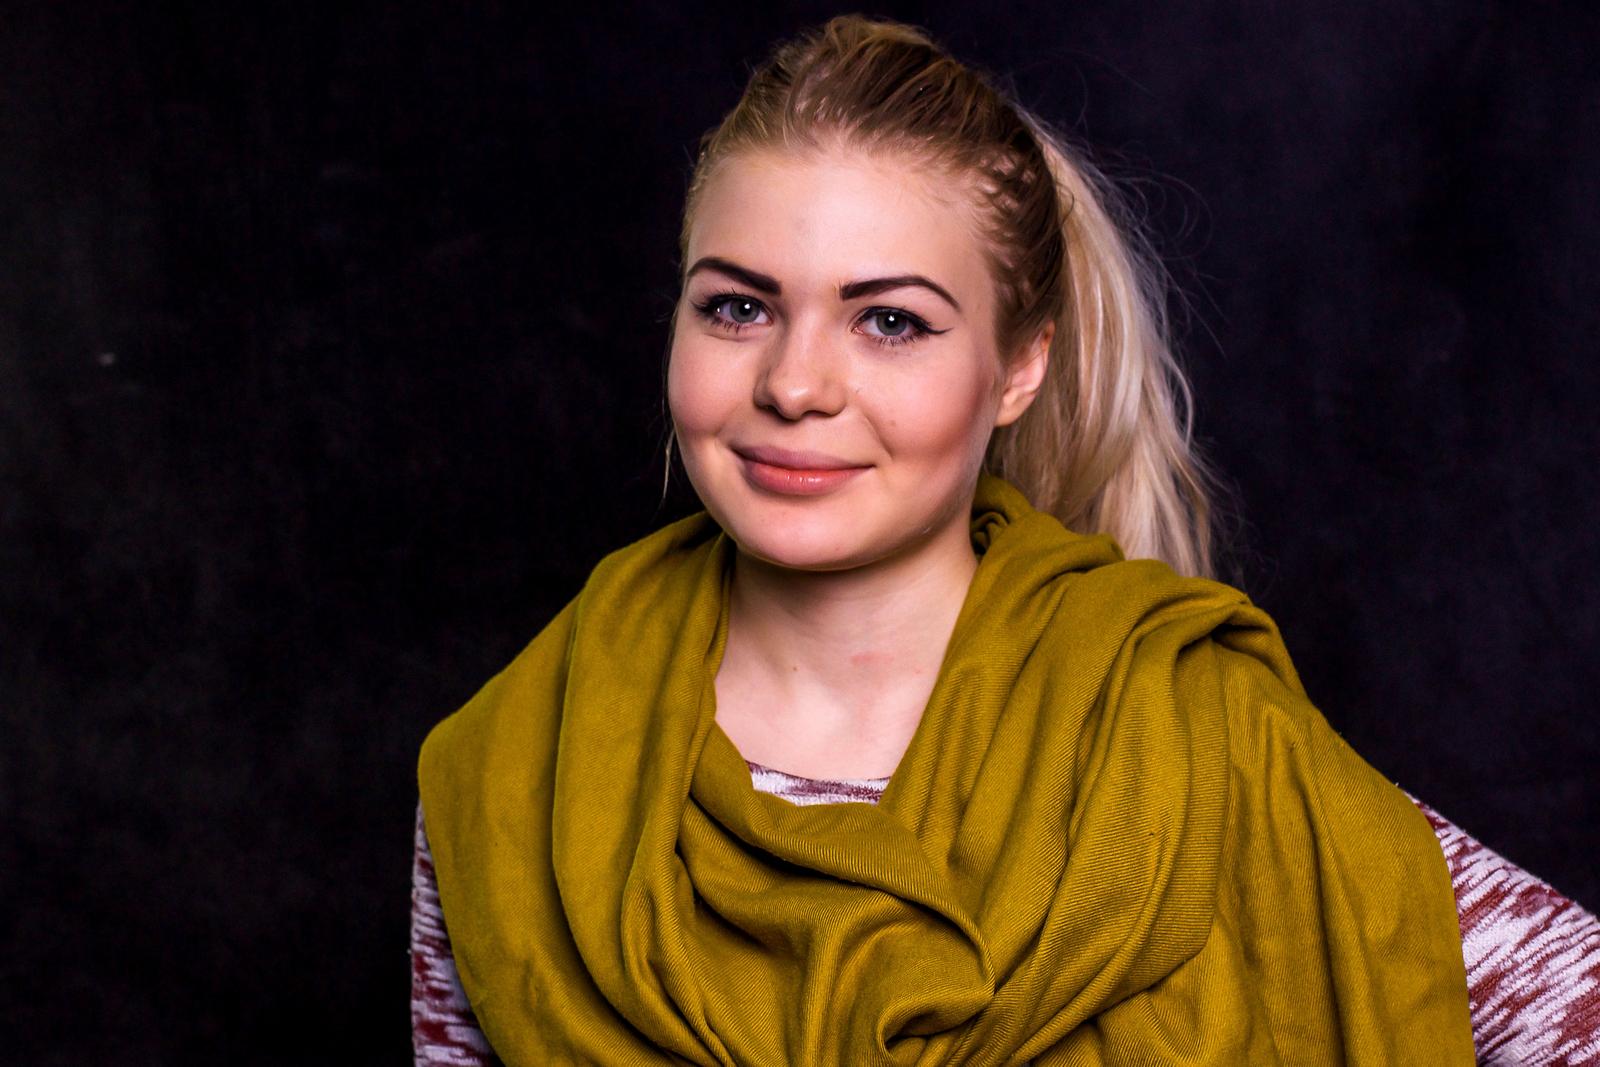 Анна Зельцман - немка, татарка, белоруска.